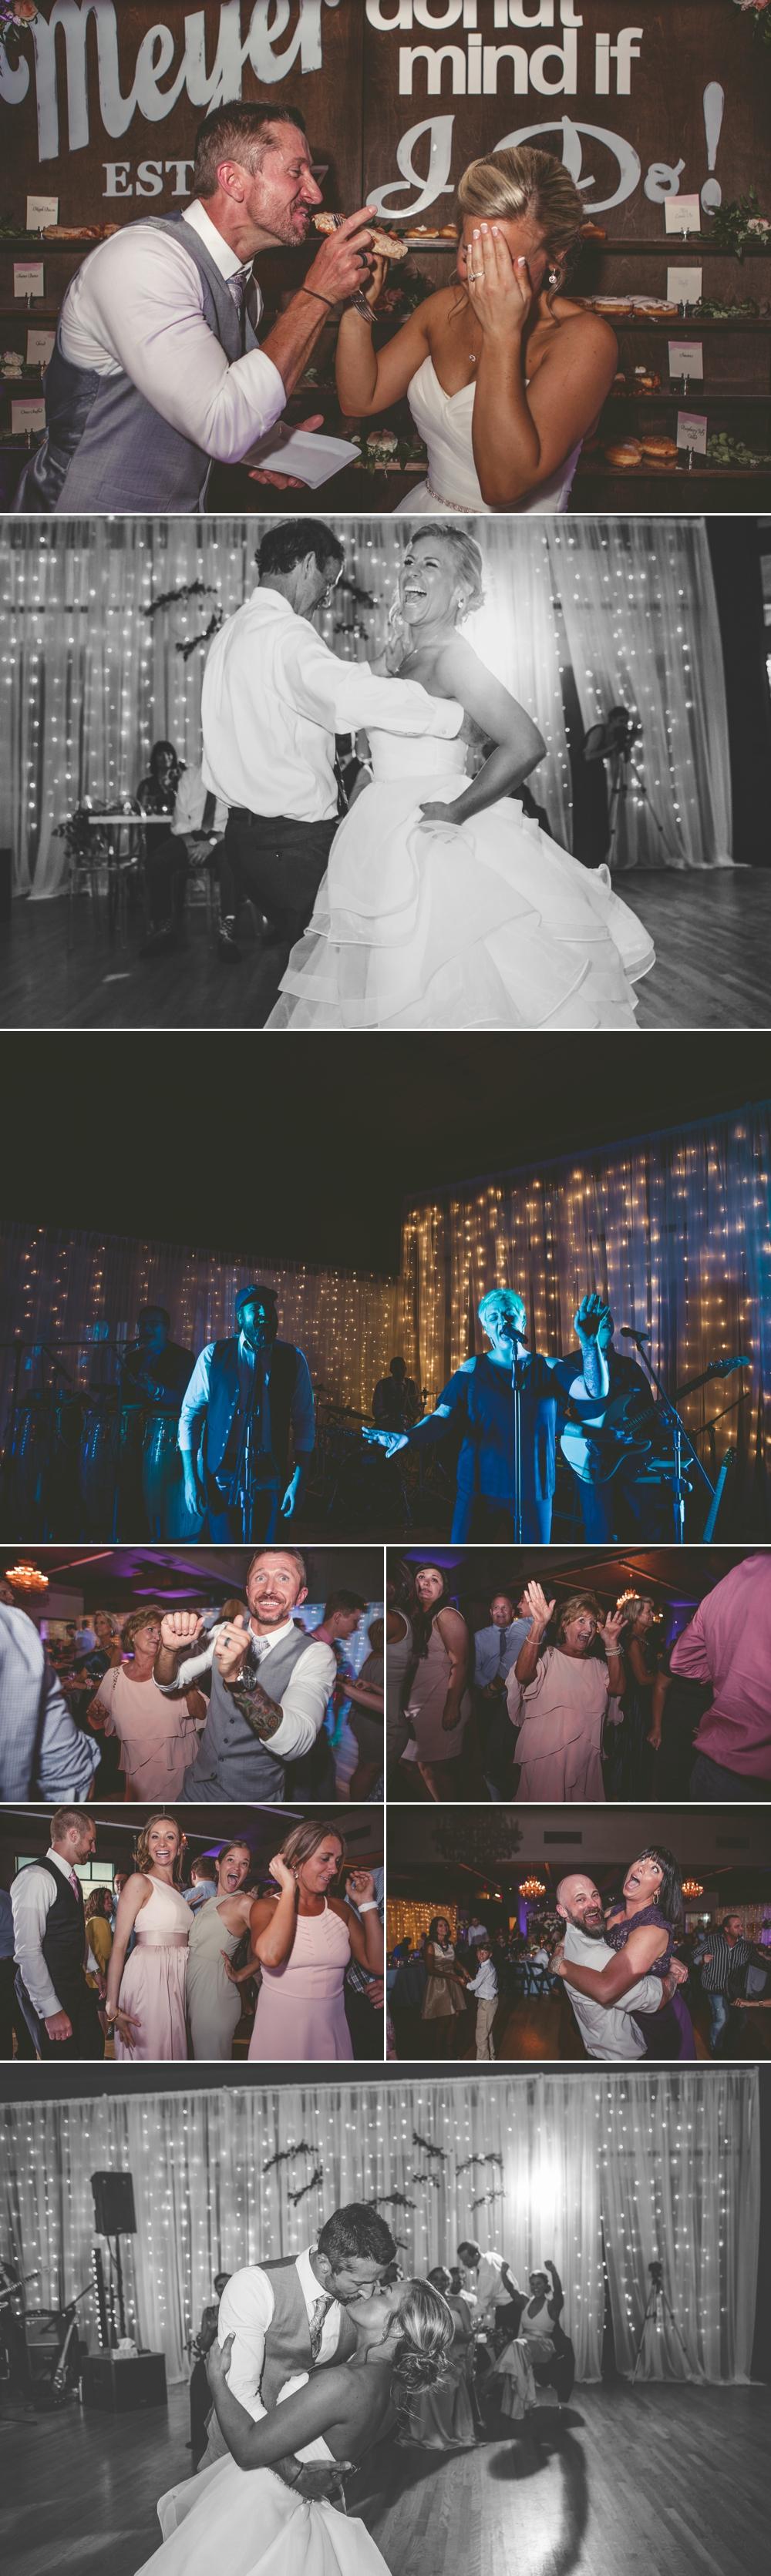 jason_domingues_photography_best_kansas_city_photographer_kc_weddings_melange_dance_mission_ks0004